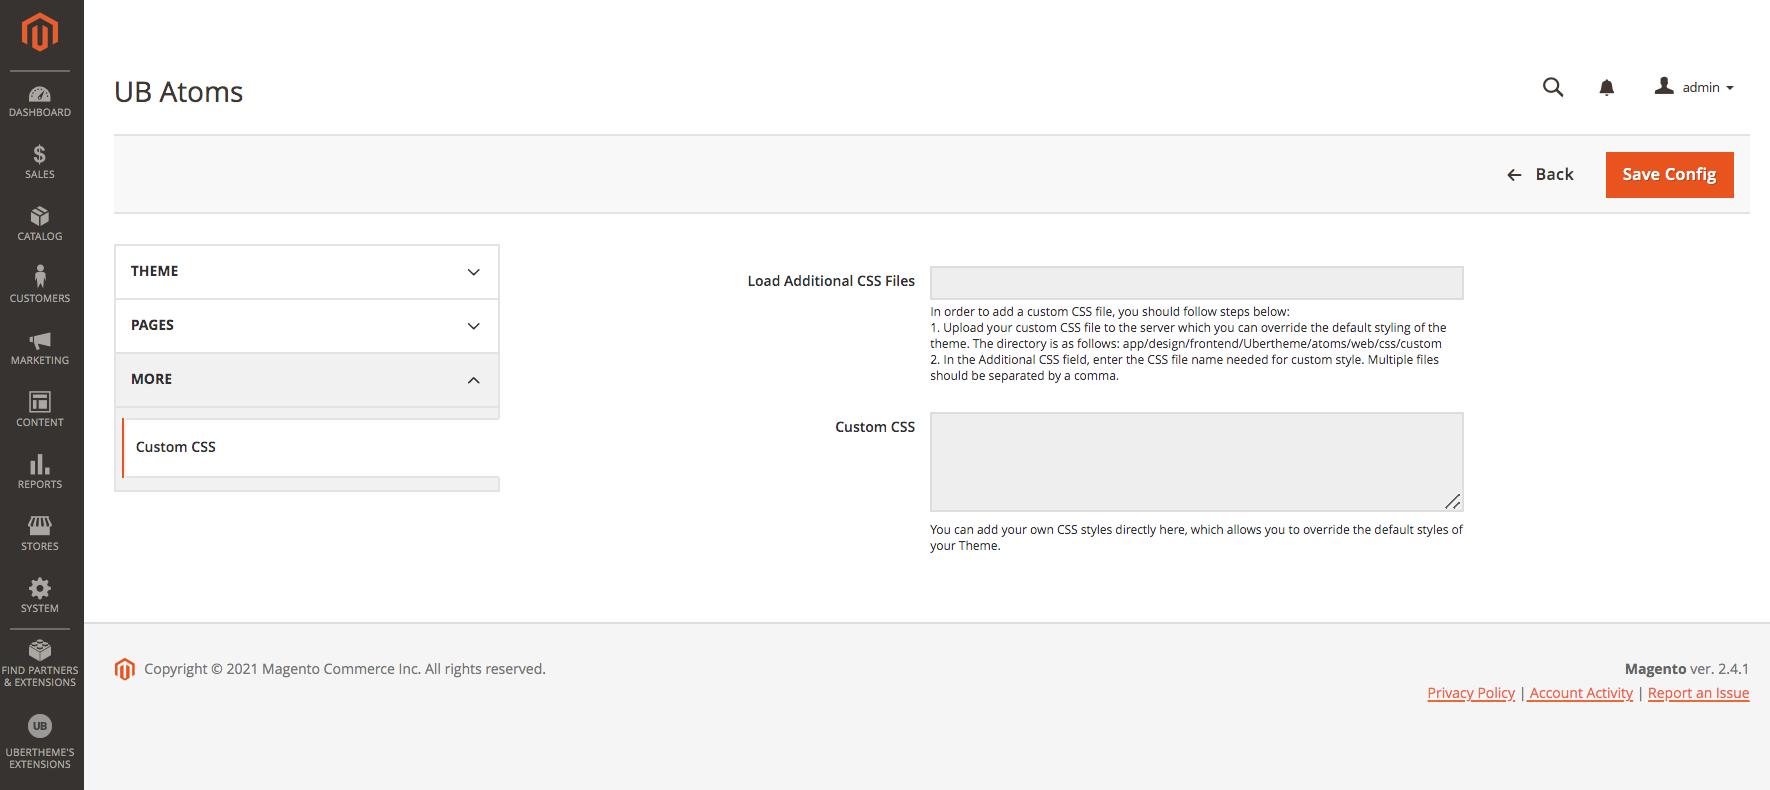 UB Atoms Customization